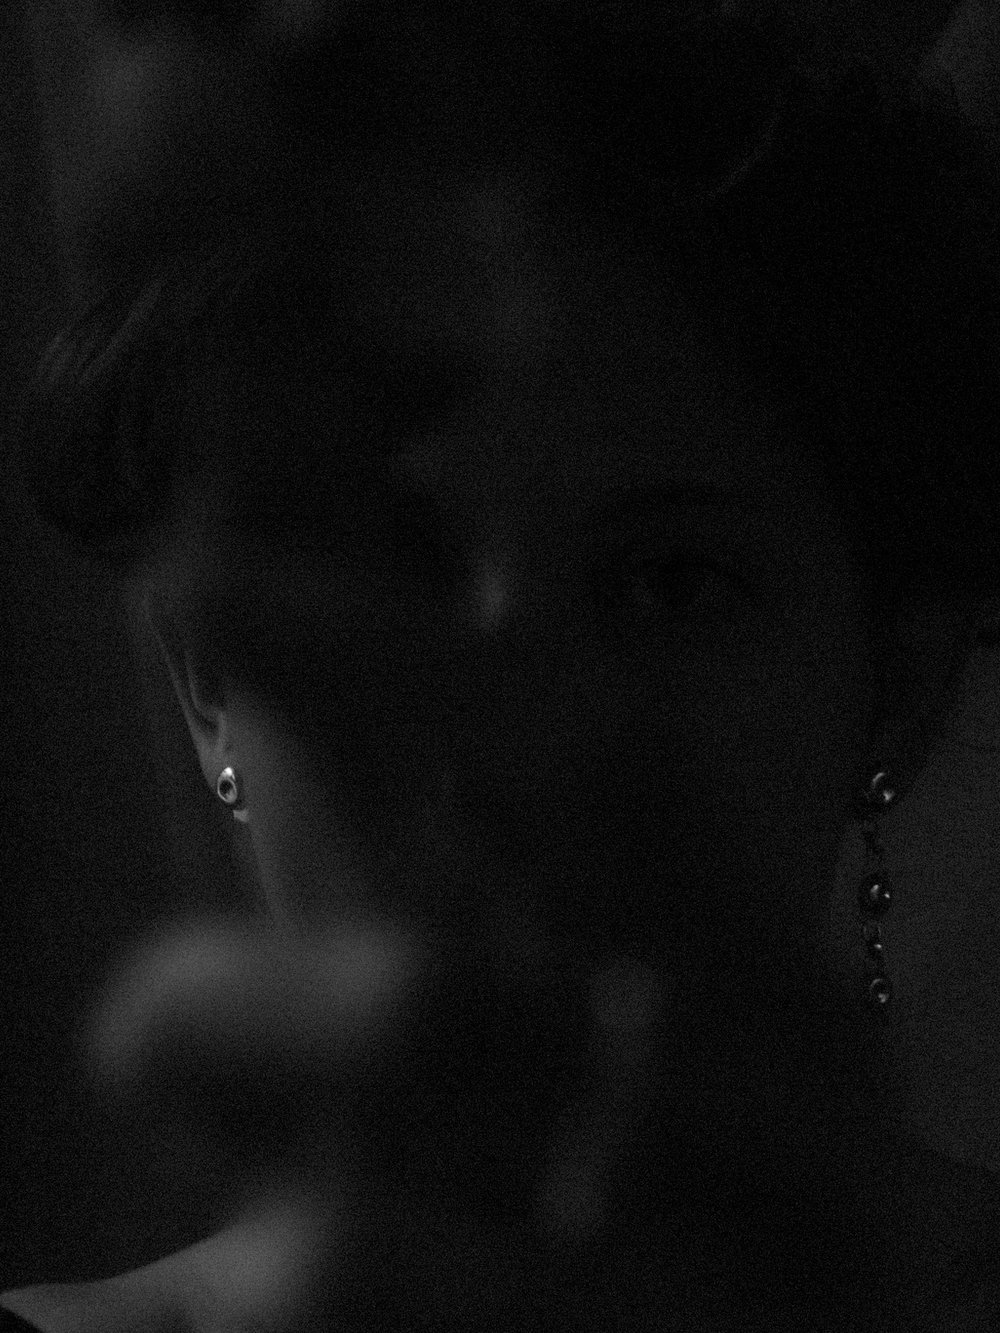 LUCIA-PEARL-JEWELRY-LOOKBOOK-SLIDES-25.jpg